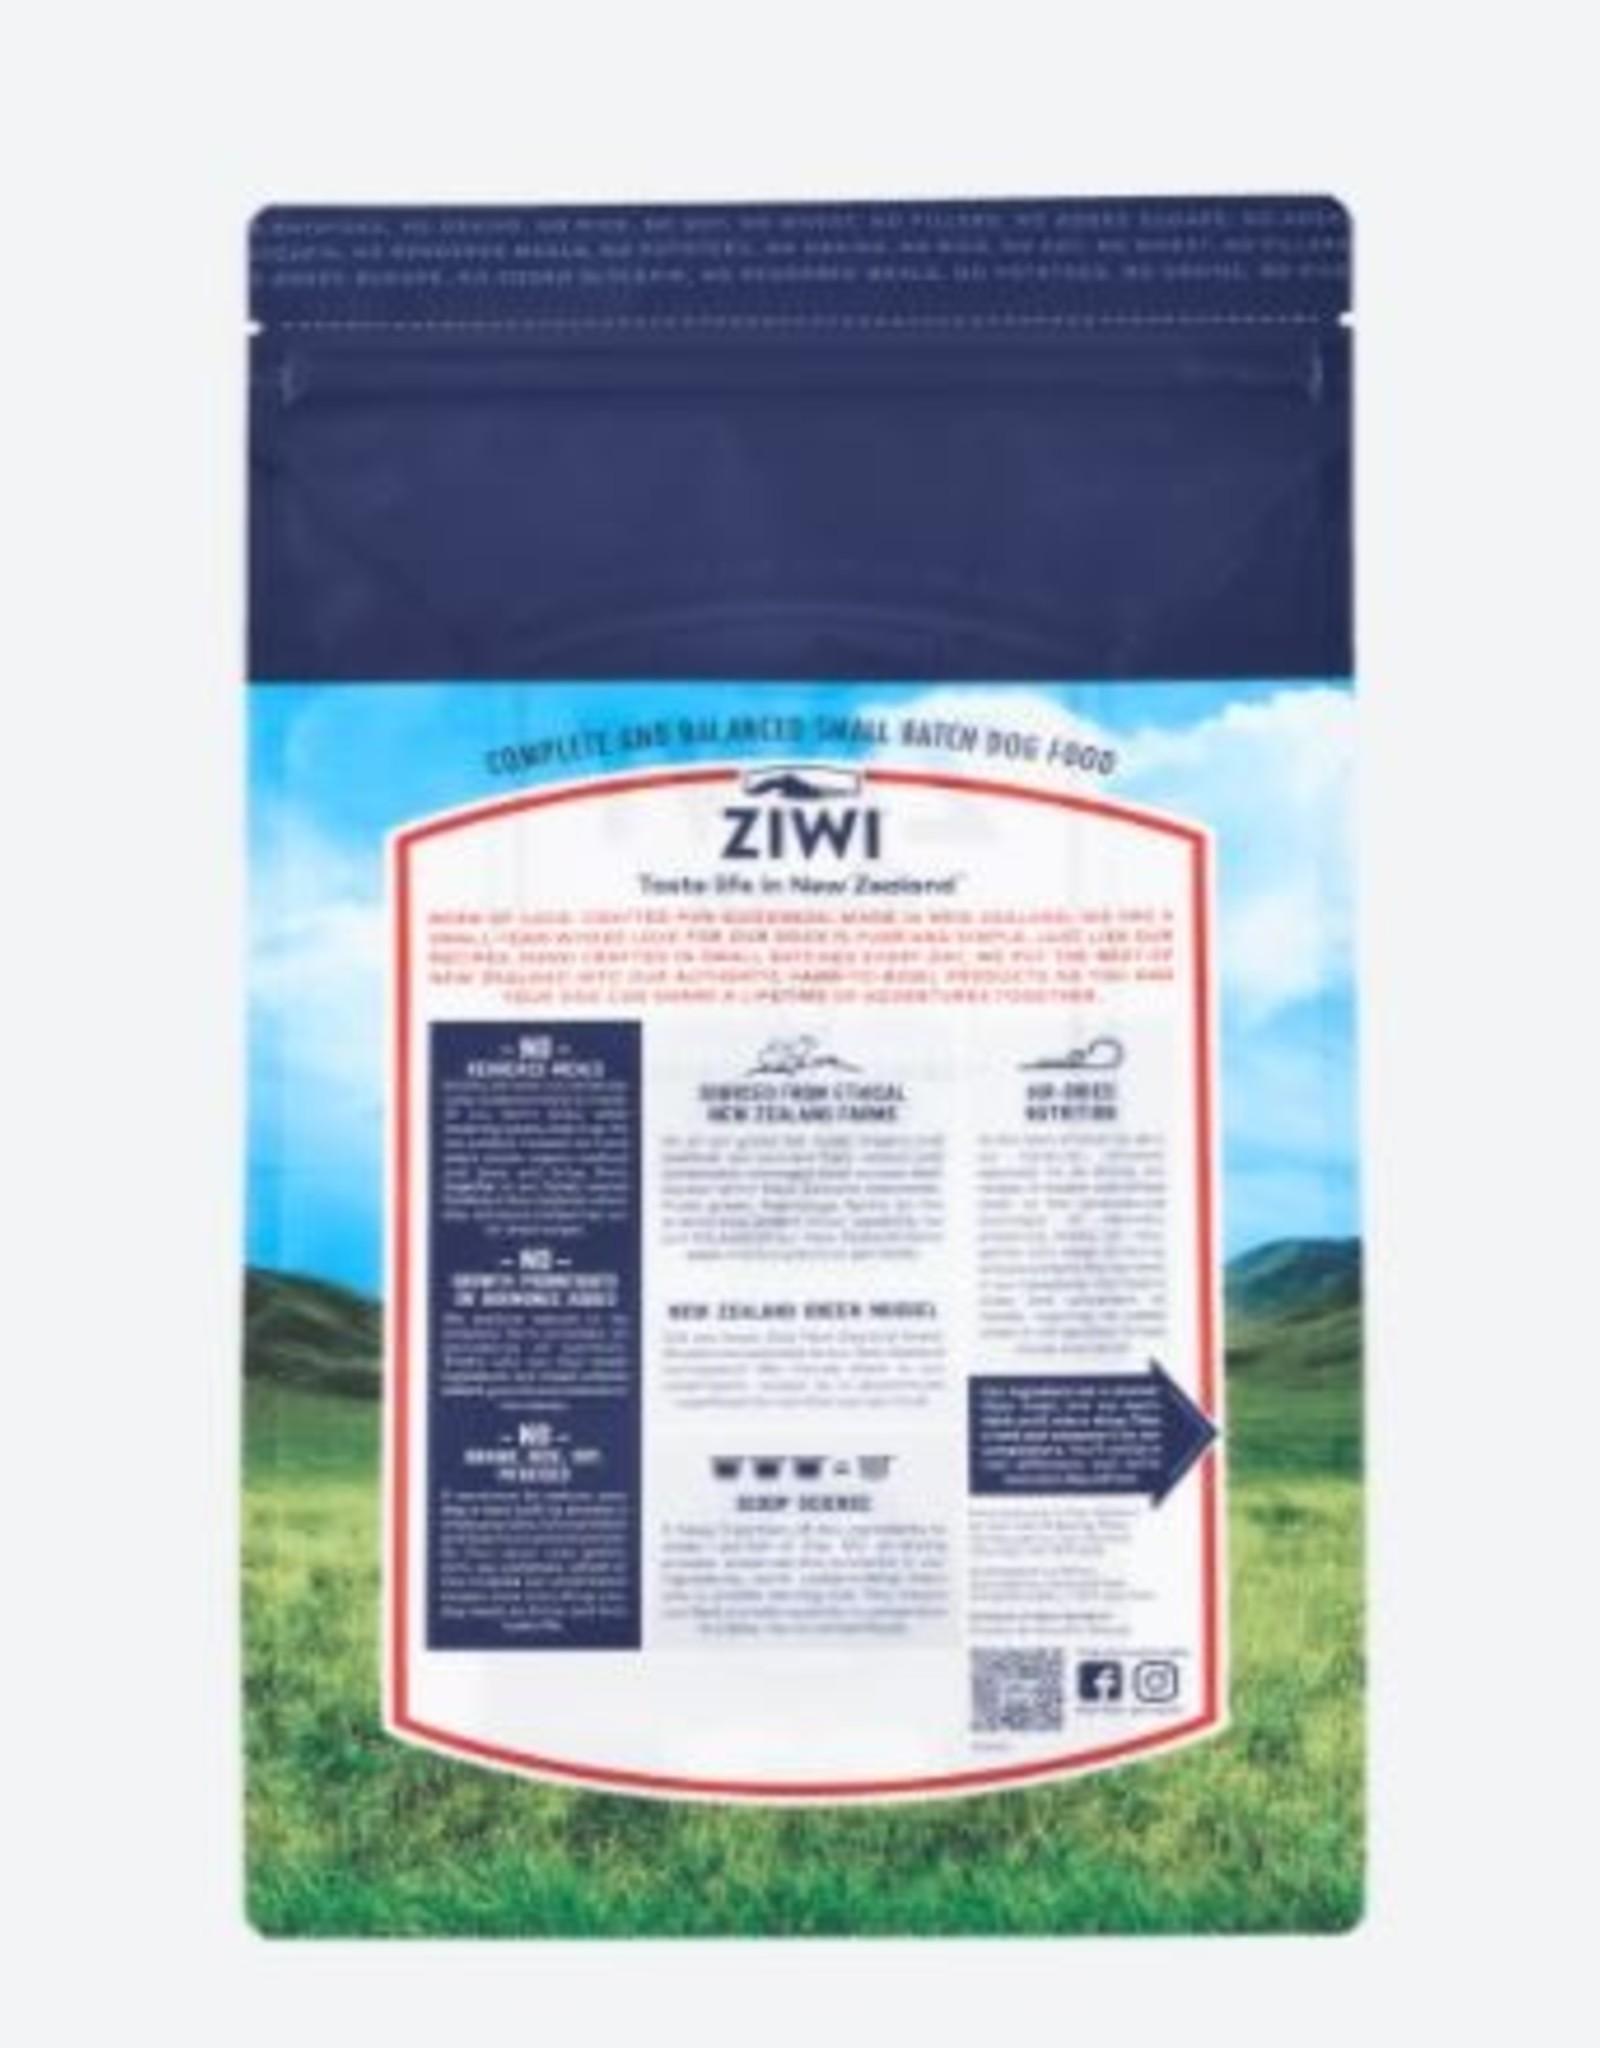 Ziwi Ziwi Peak - Dog Food - Venison Flavored - 16oz